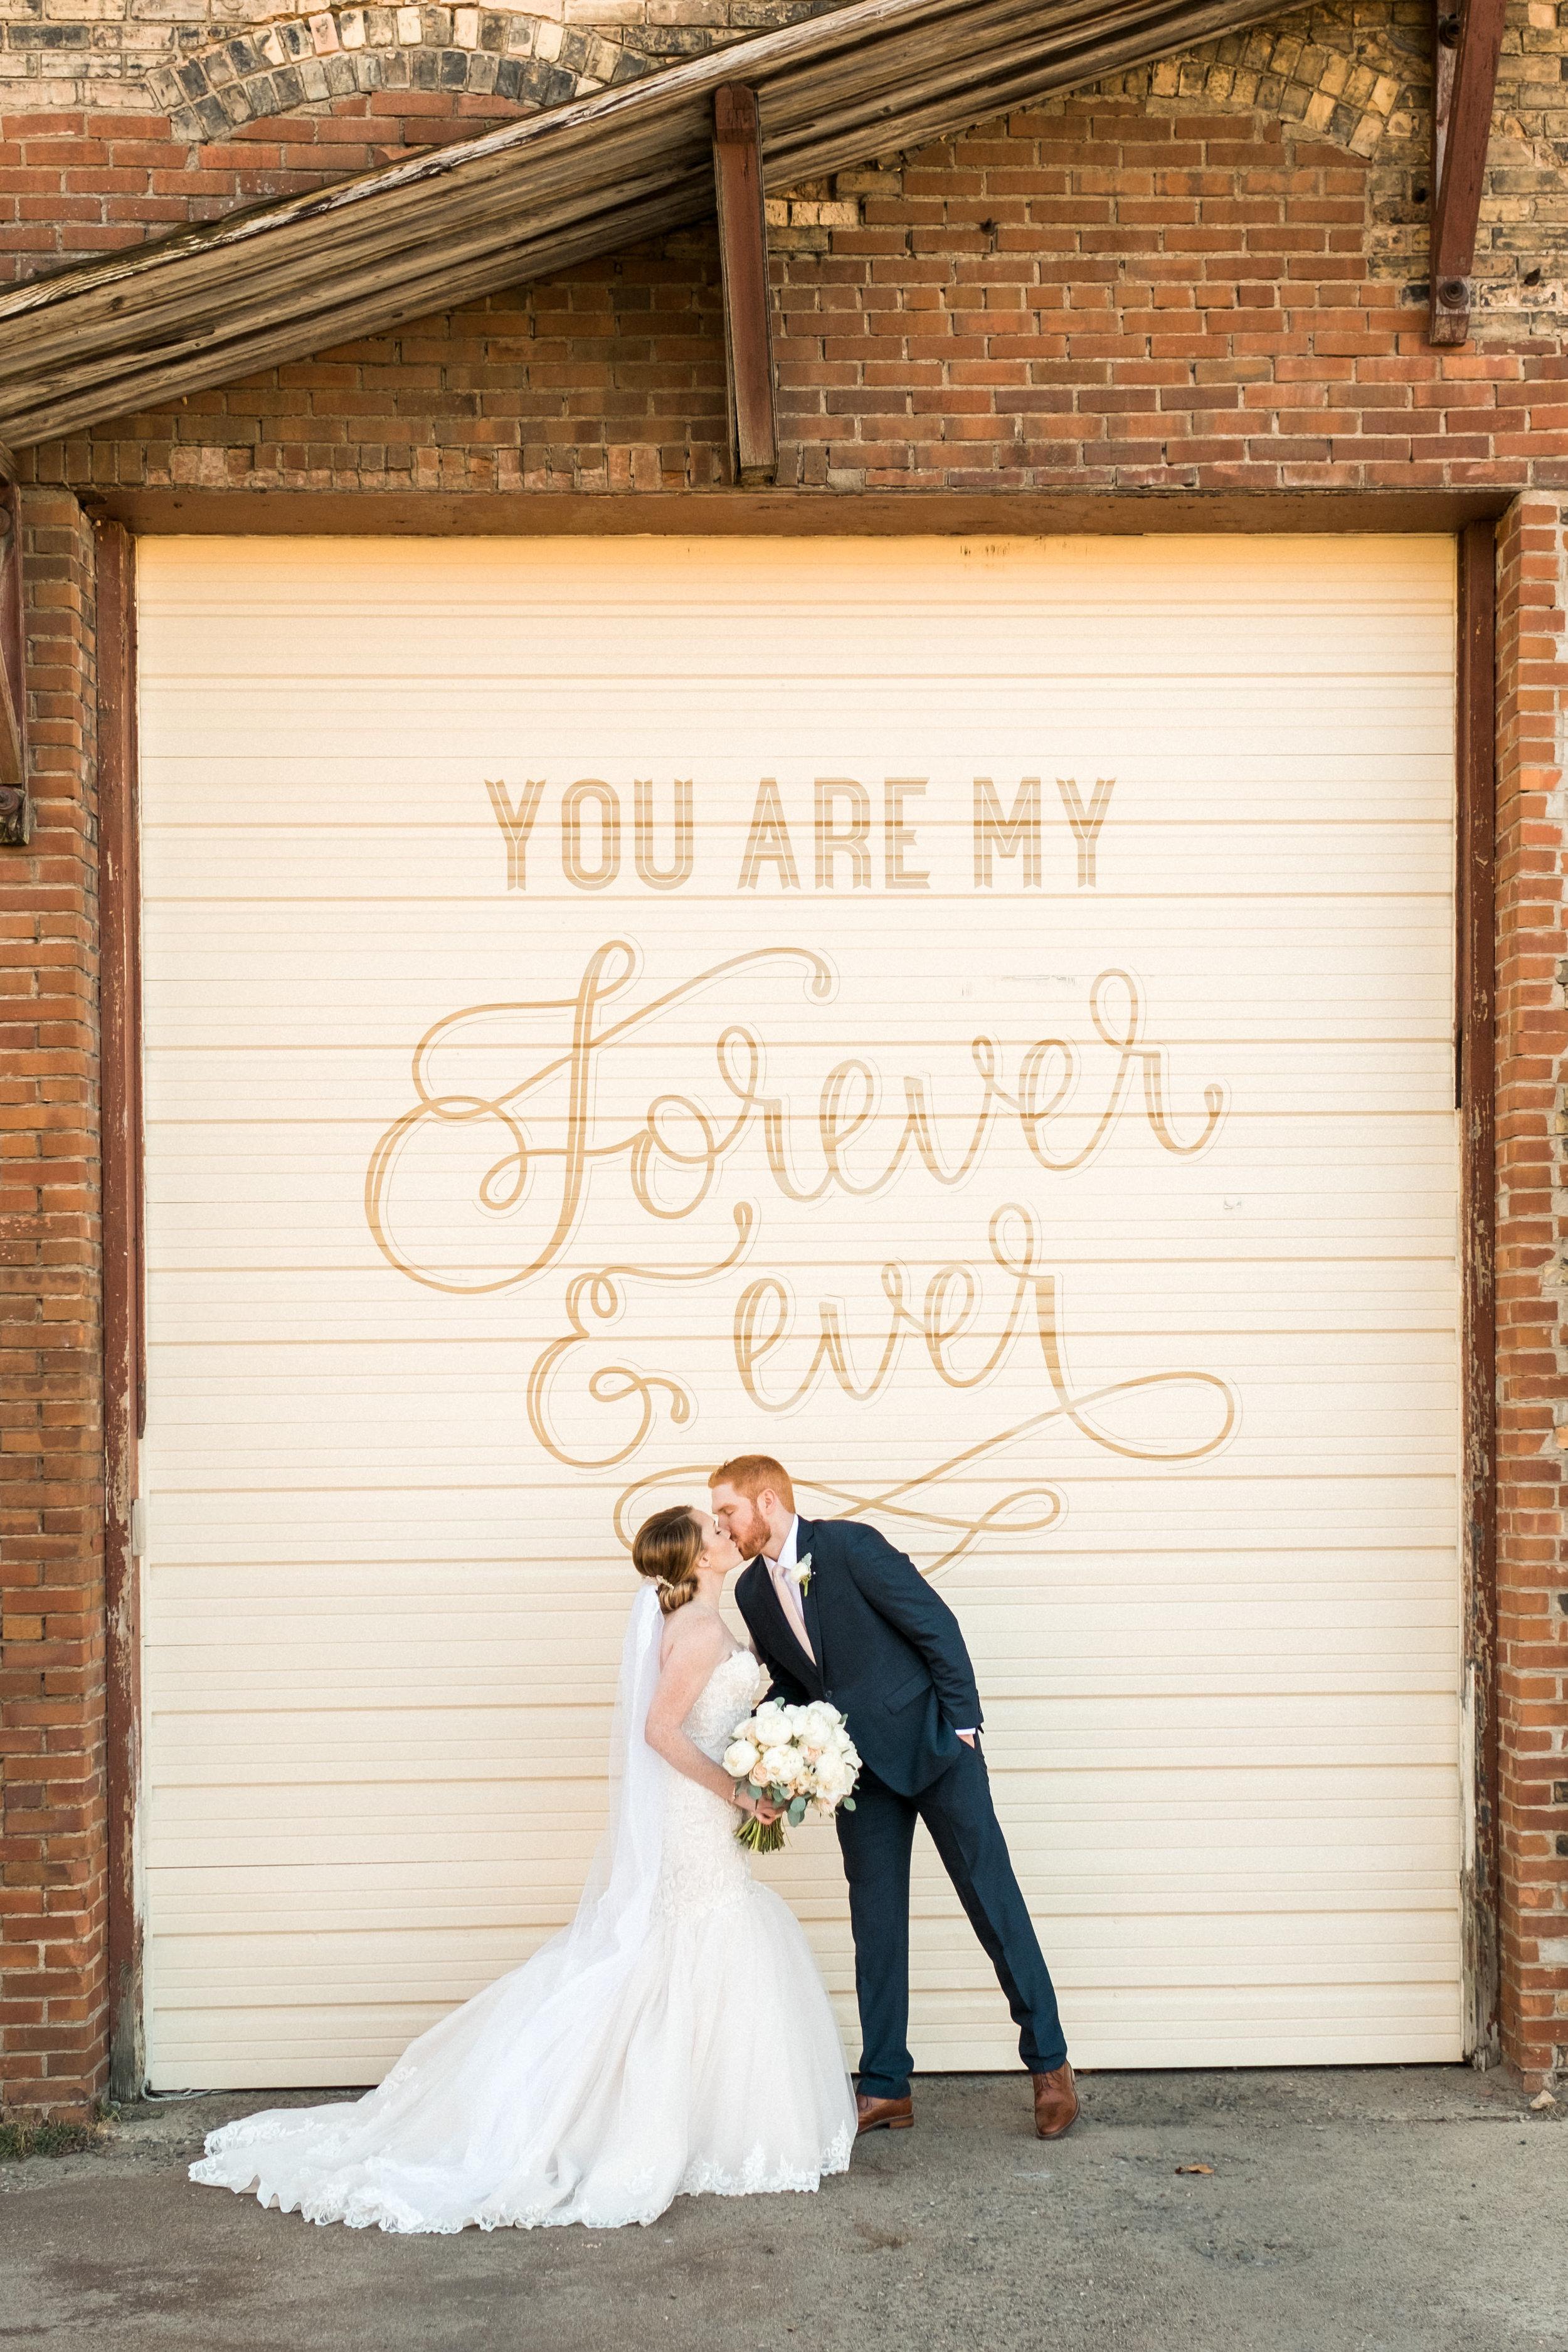 outdoor wedding signage NP Space minnesota